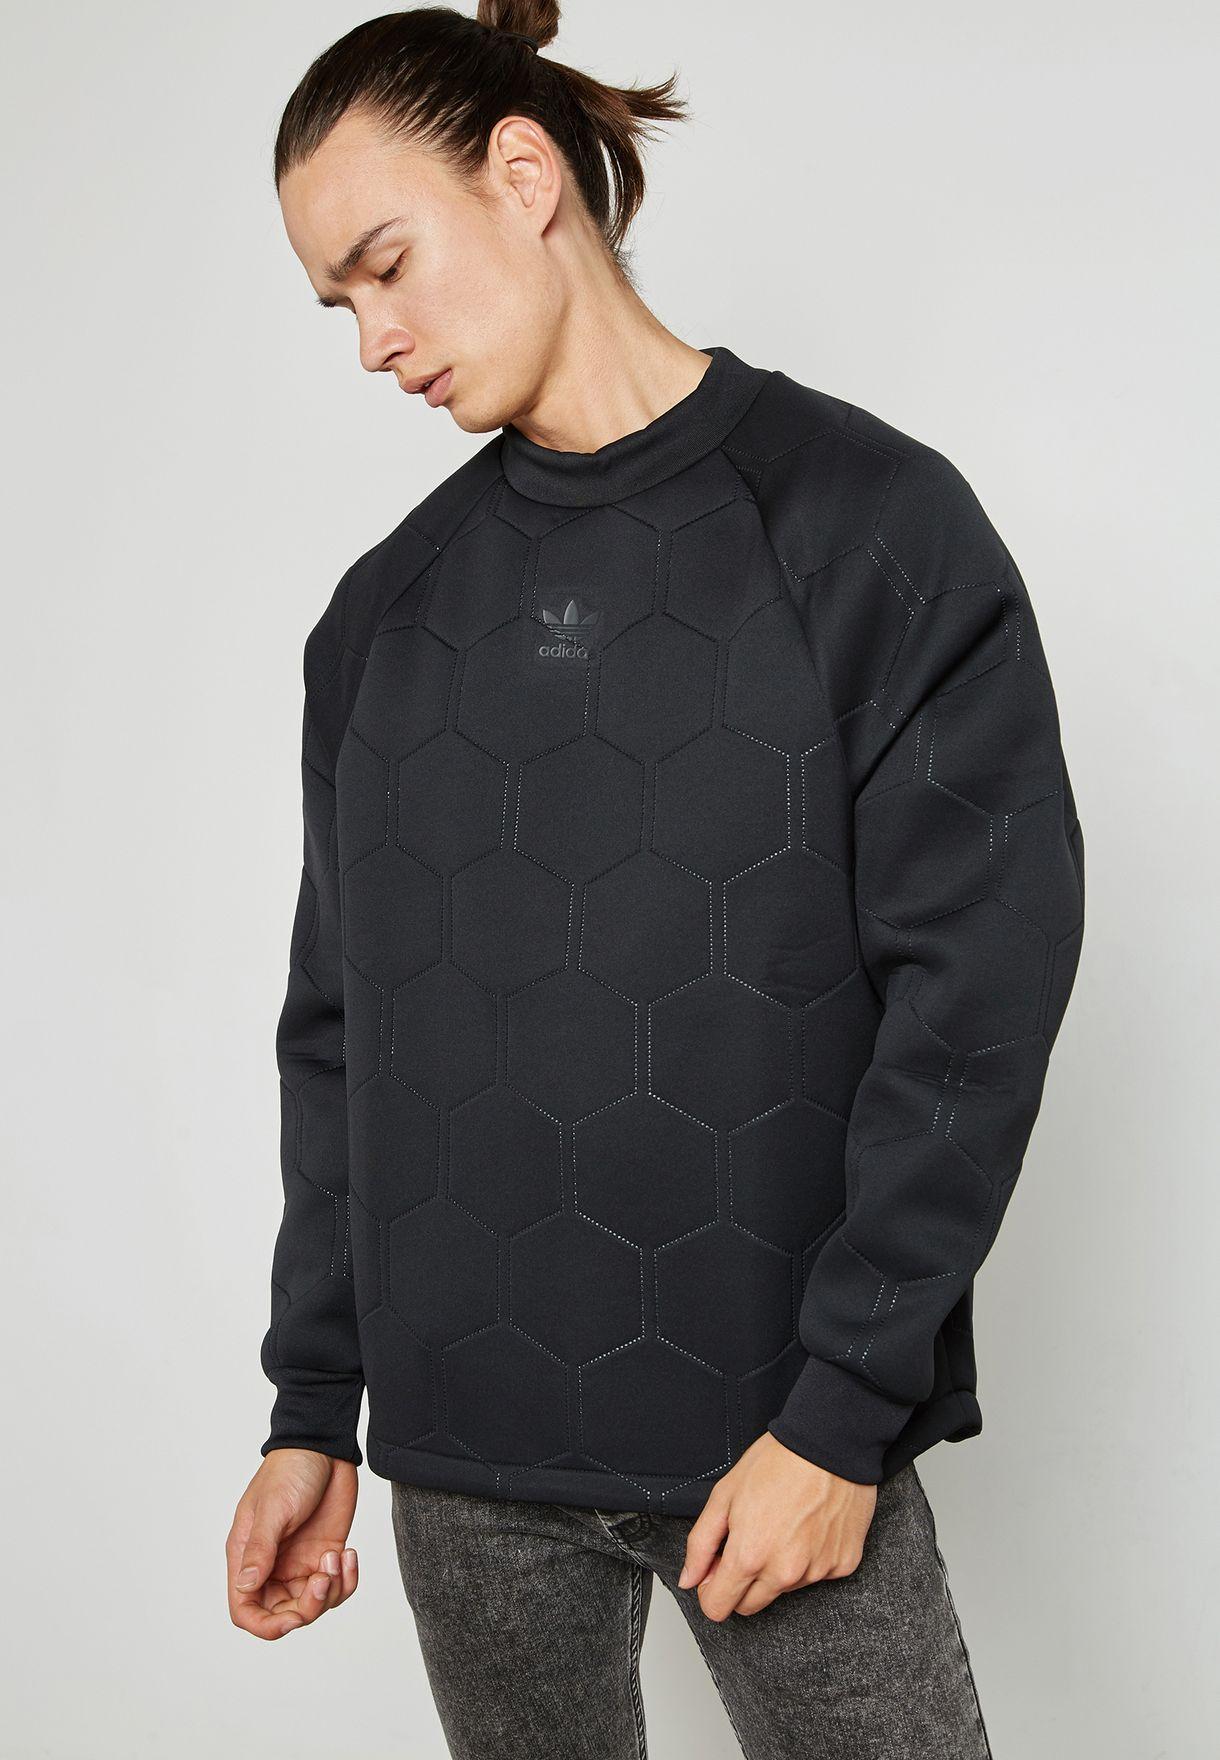 Sonic Soccer Sweatshirt